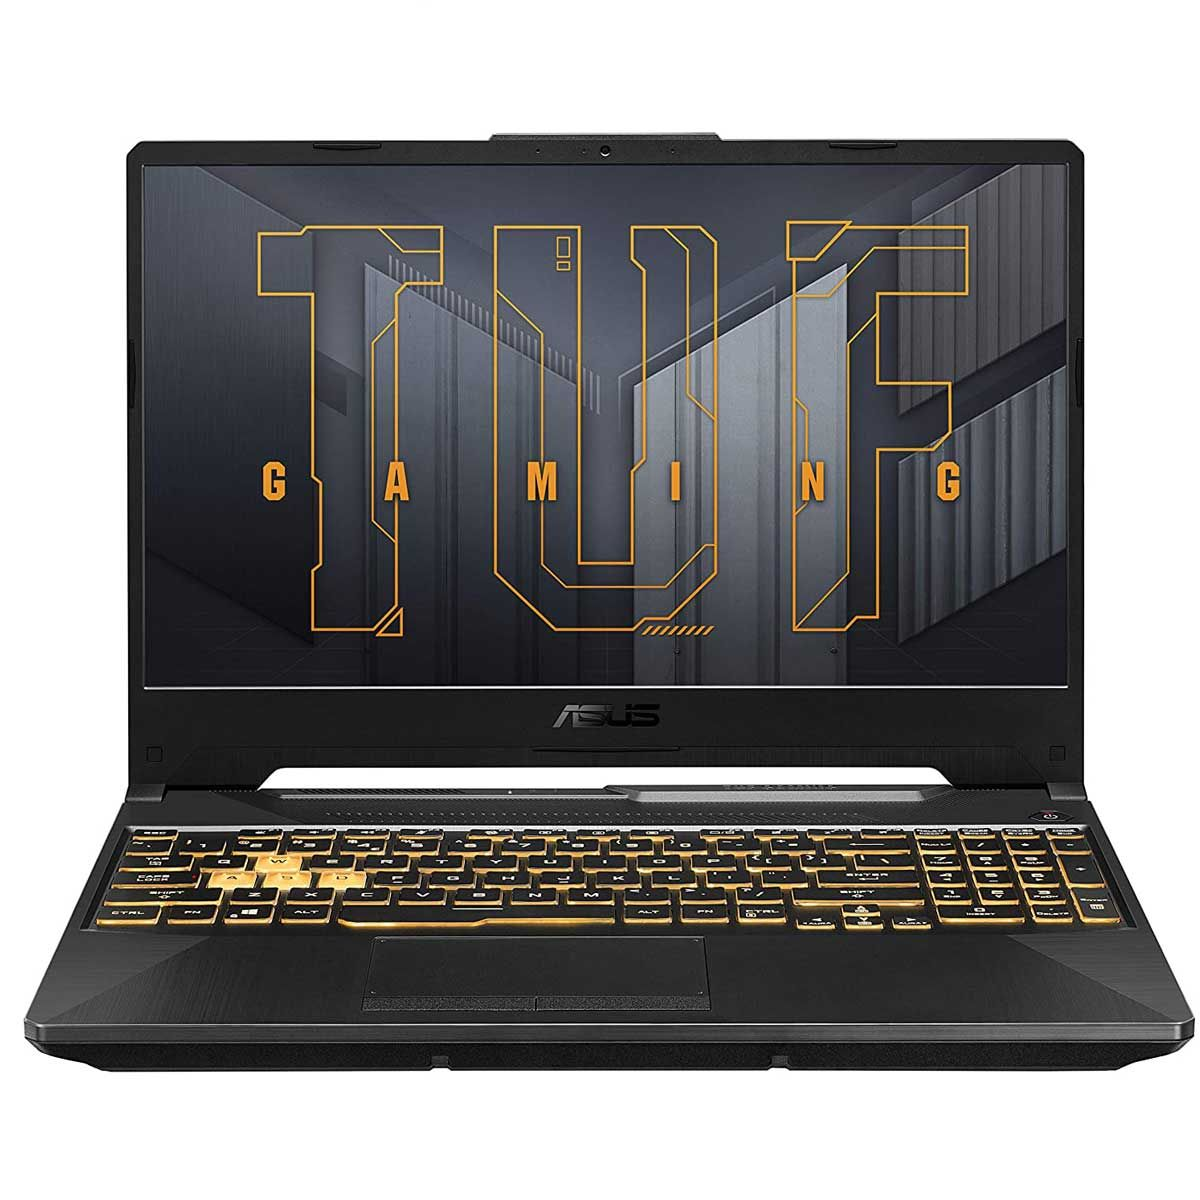 ASUS TUF Gaming F15 11th Gen Core i7-11800H (2021)